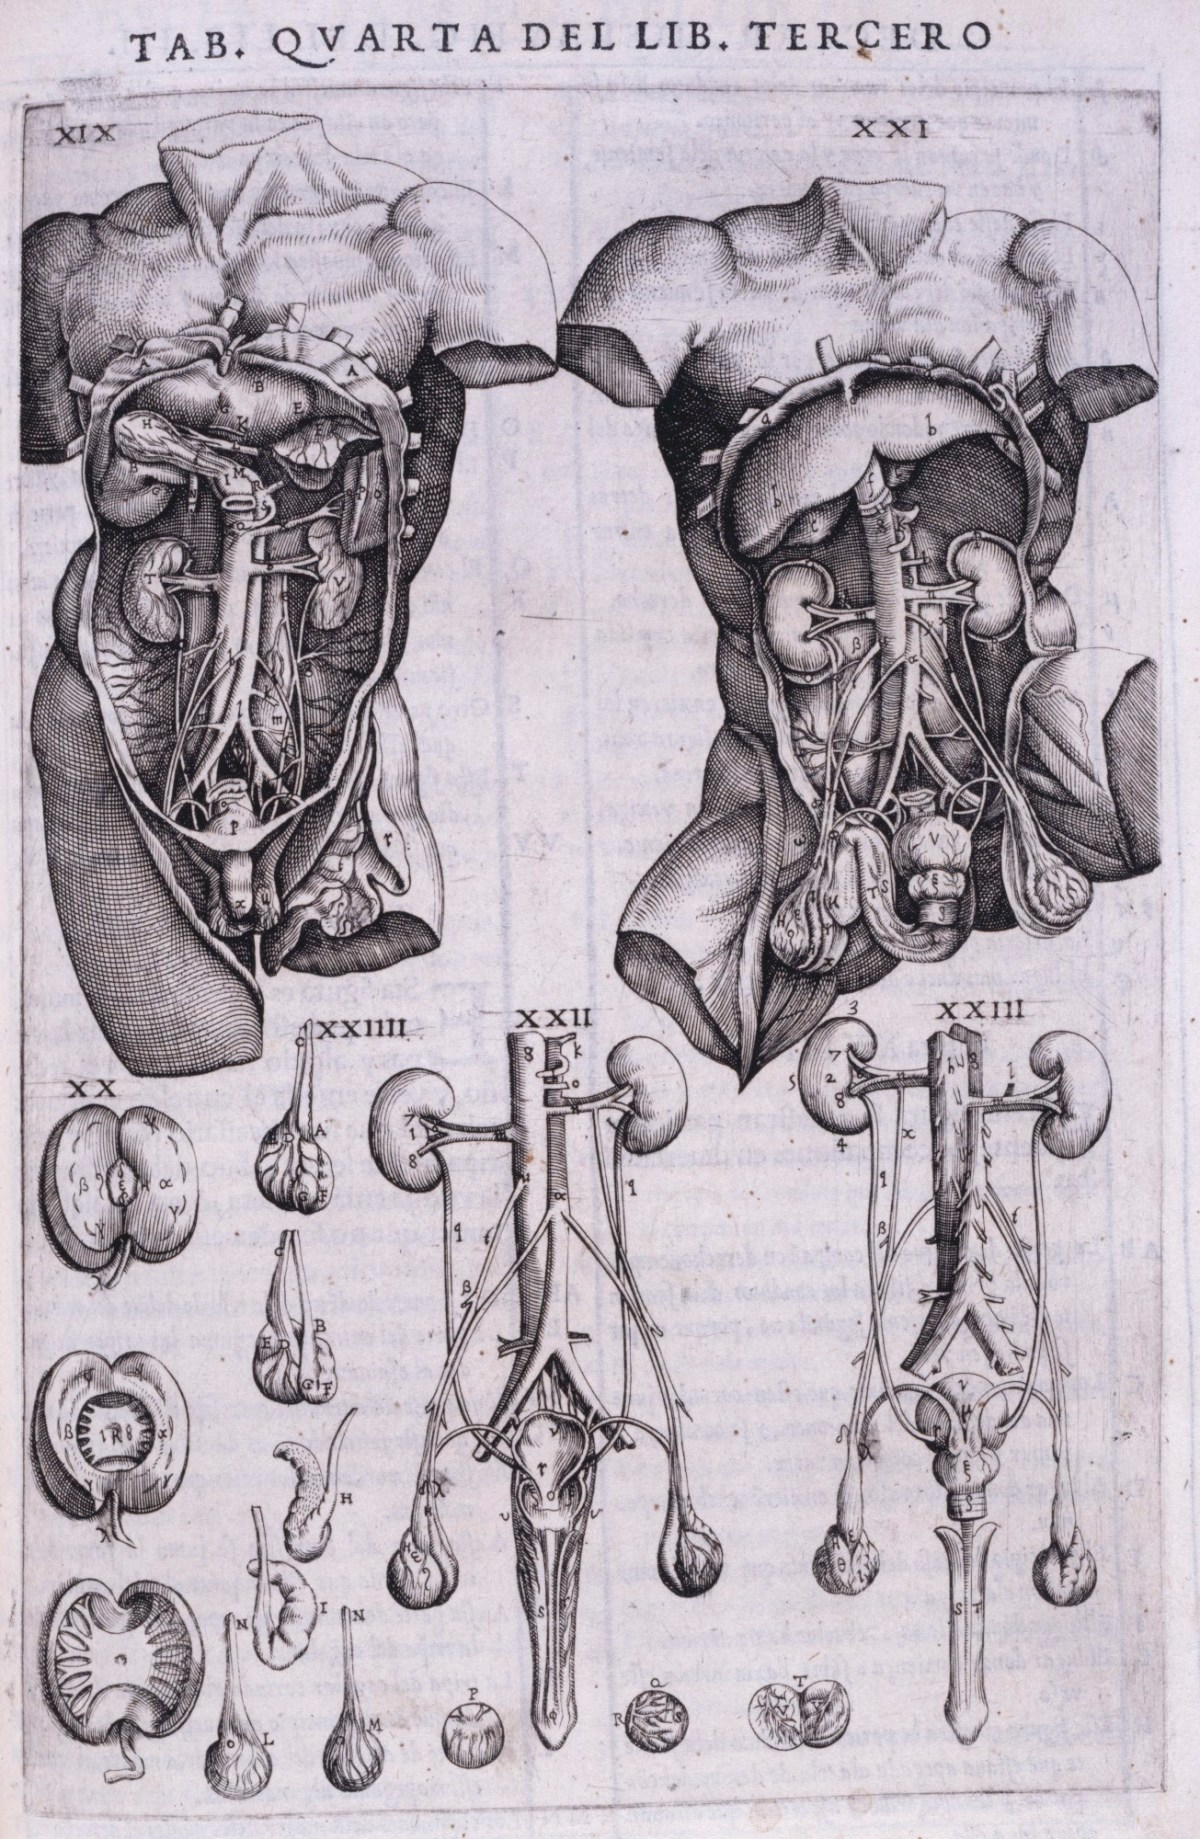 Internal Organs Of Human Body Works Of Art Ra Collection Royal